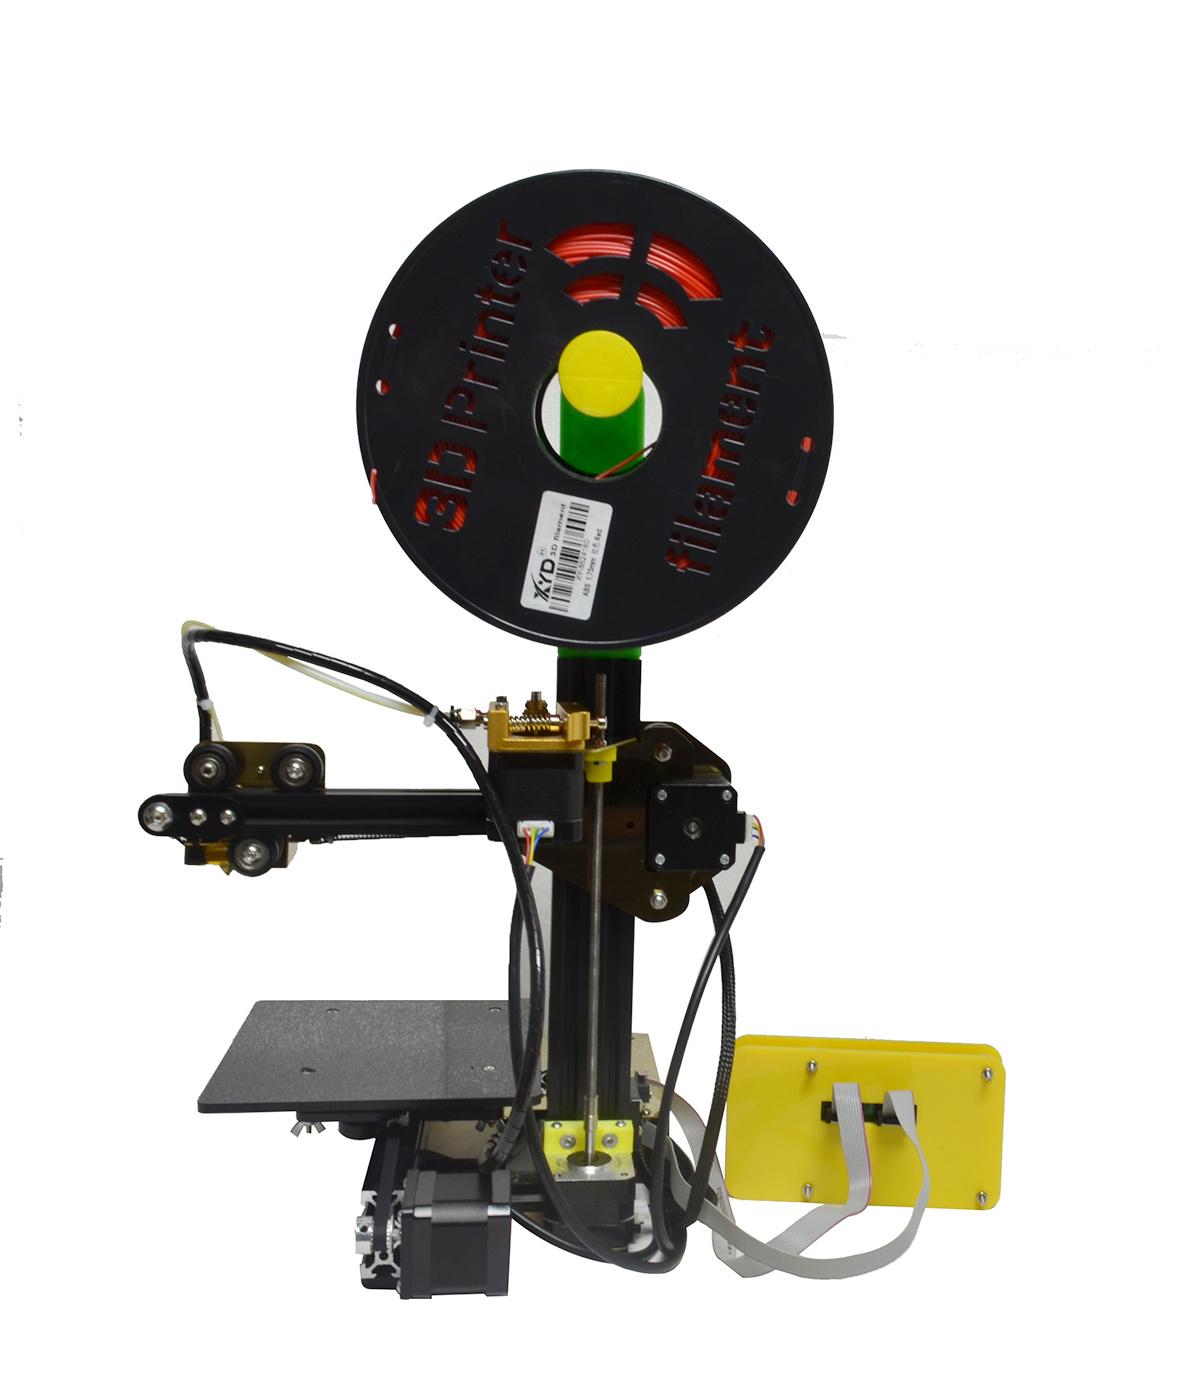 Hot Sale 150*150*100mm Aluminum Structure Fdm Desktop DIY 3D Printer